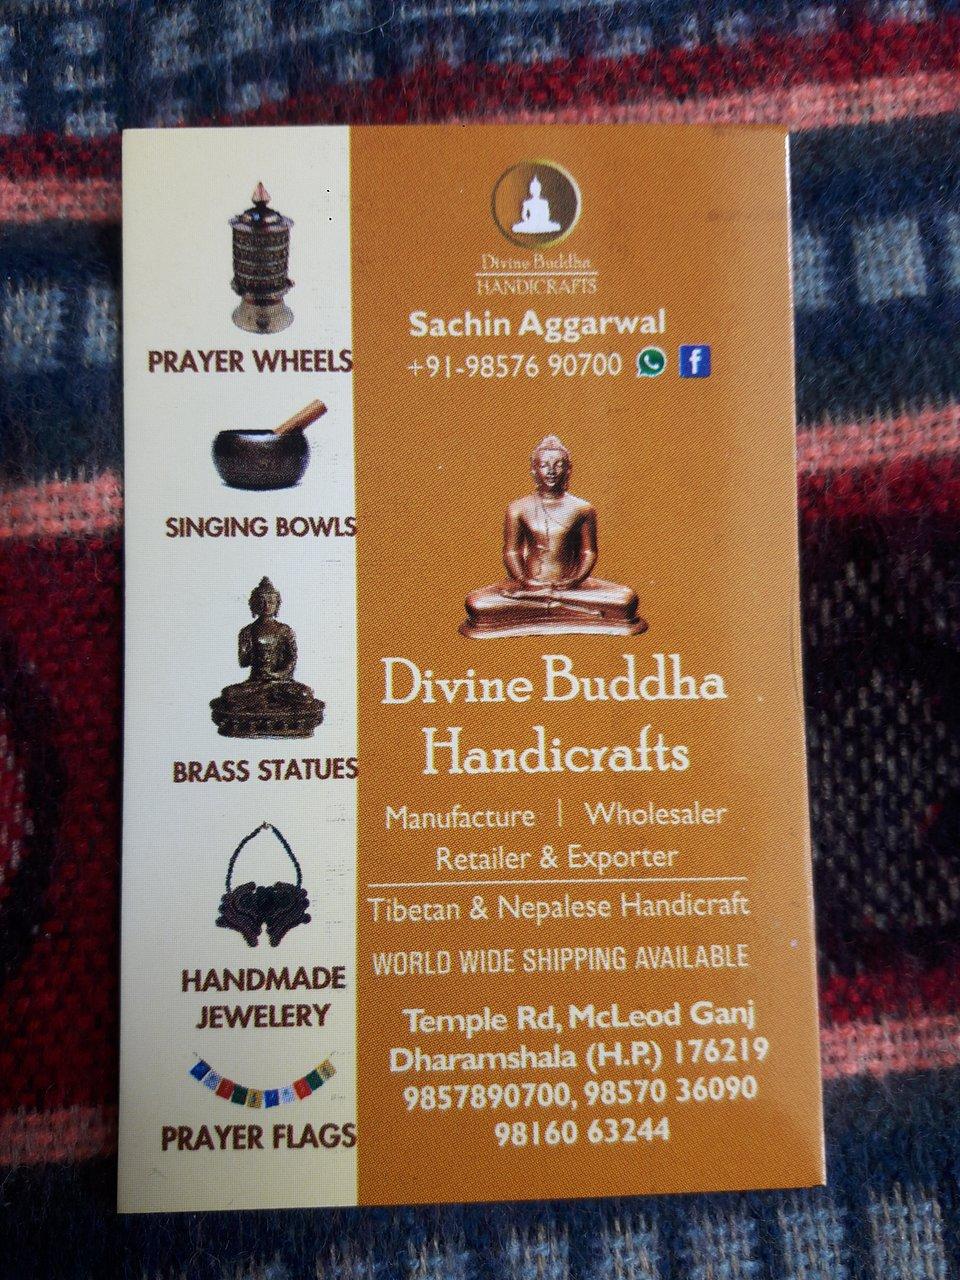 Divine Buddha Handicrafts Mcleod Ganj 2019 All You Need To Know